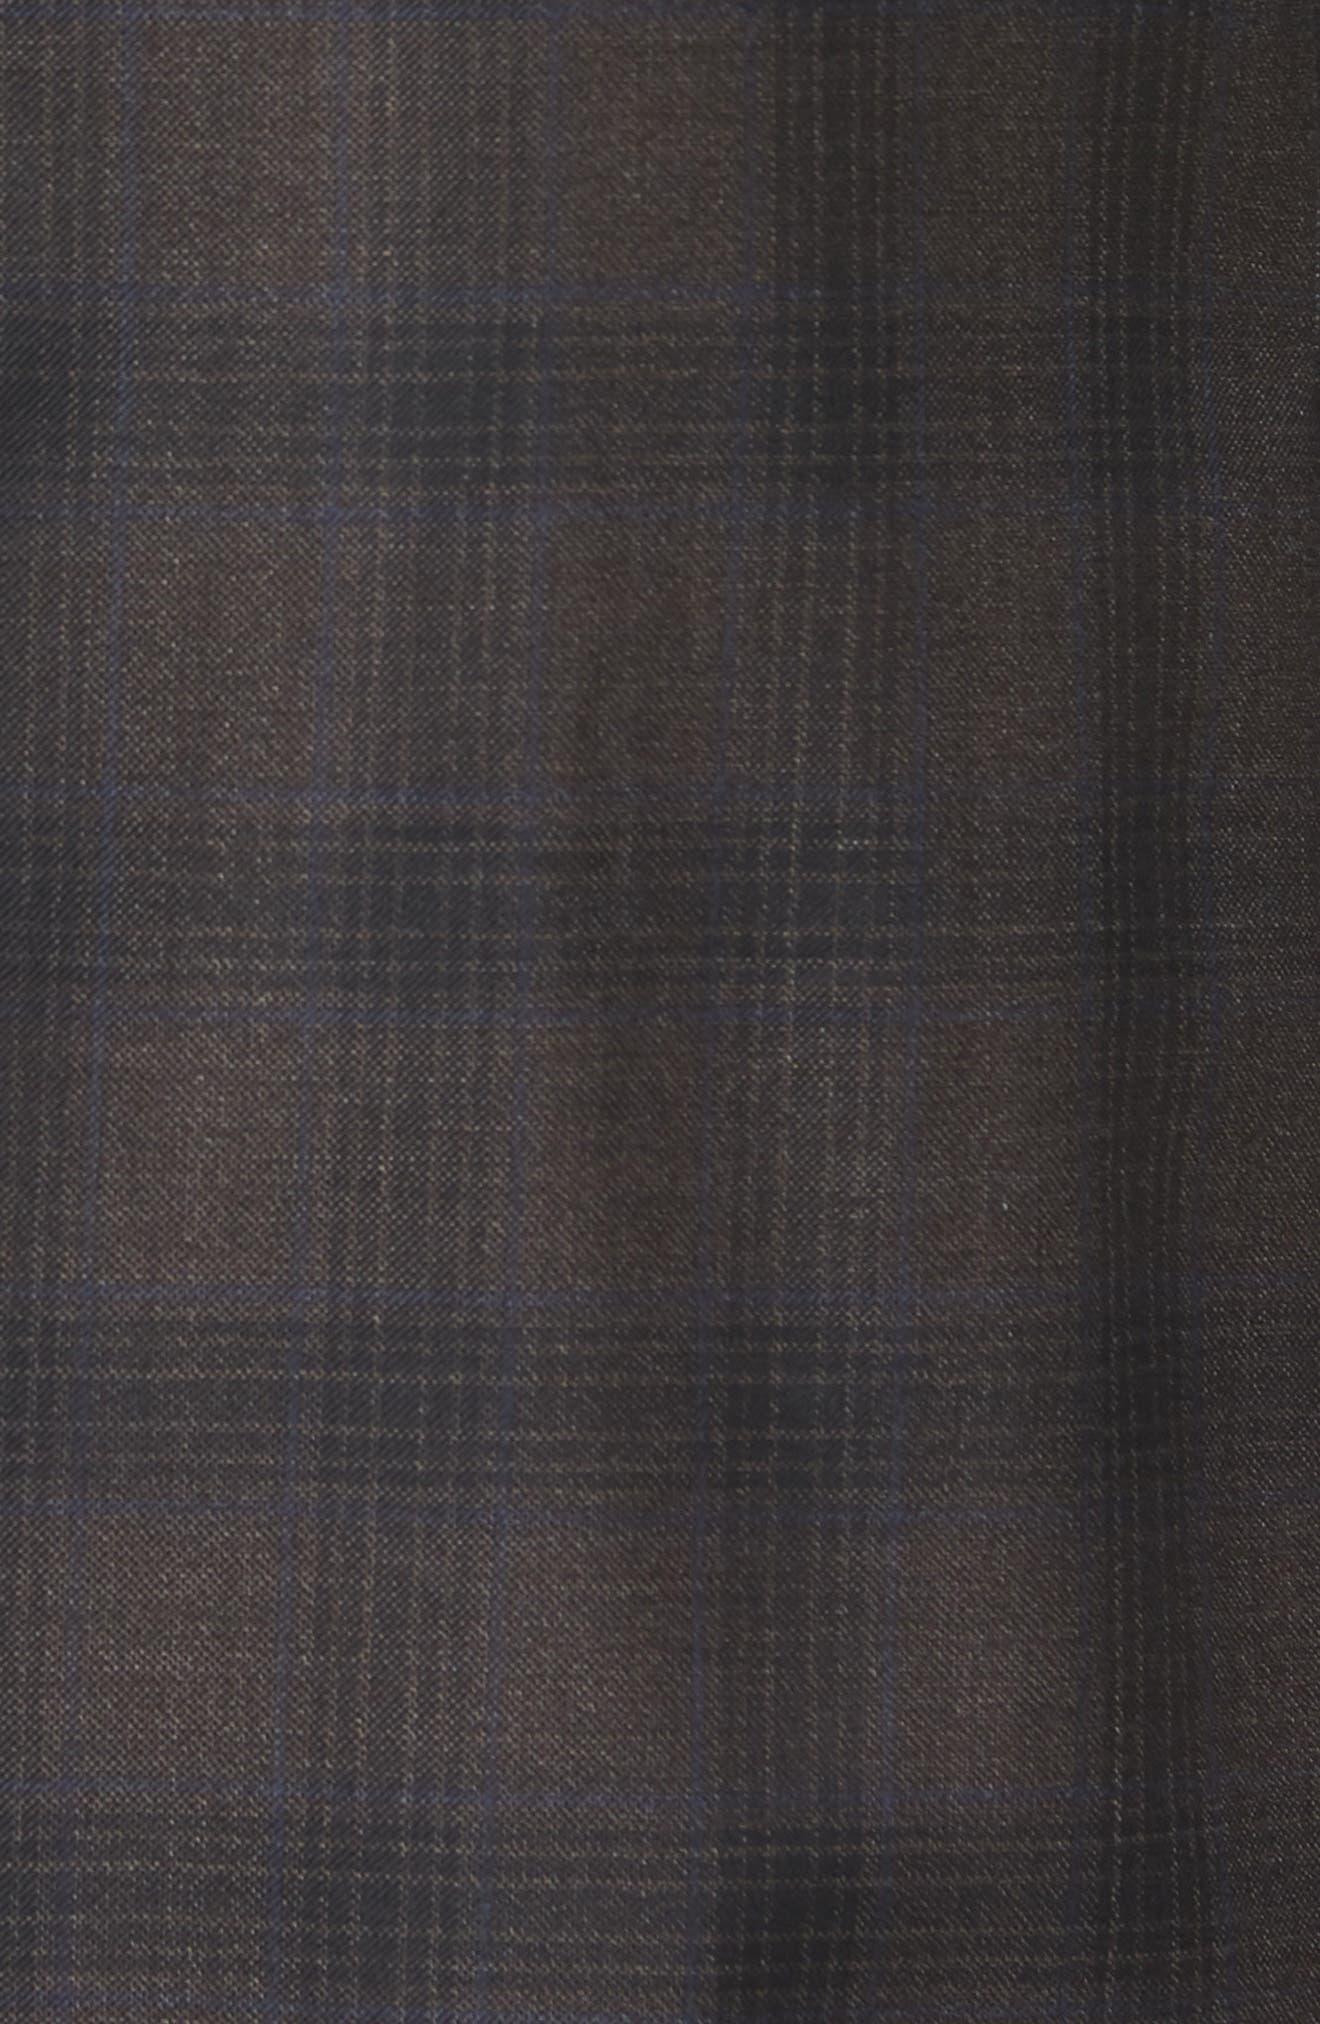 Classic Fit Plaid Wool Sport Coat,                             Alternate thumbnail 5, color,                             Brown